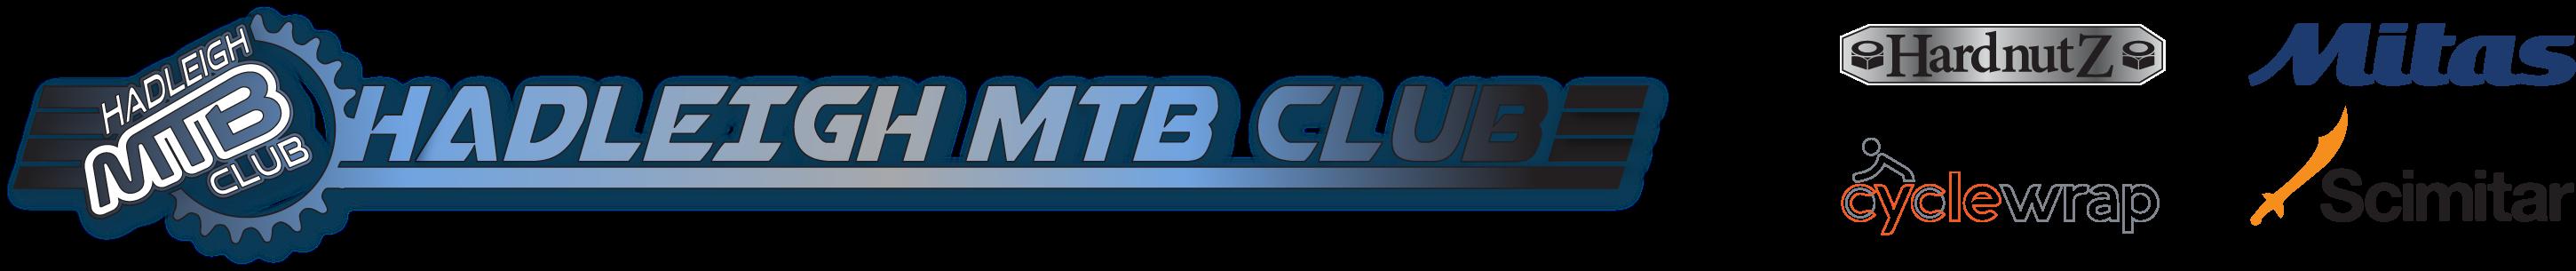 Hadleigh MTB Club